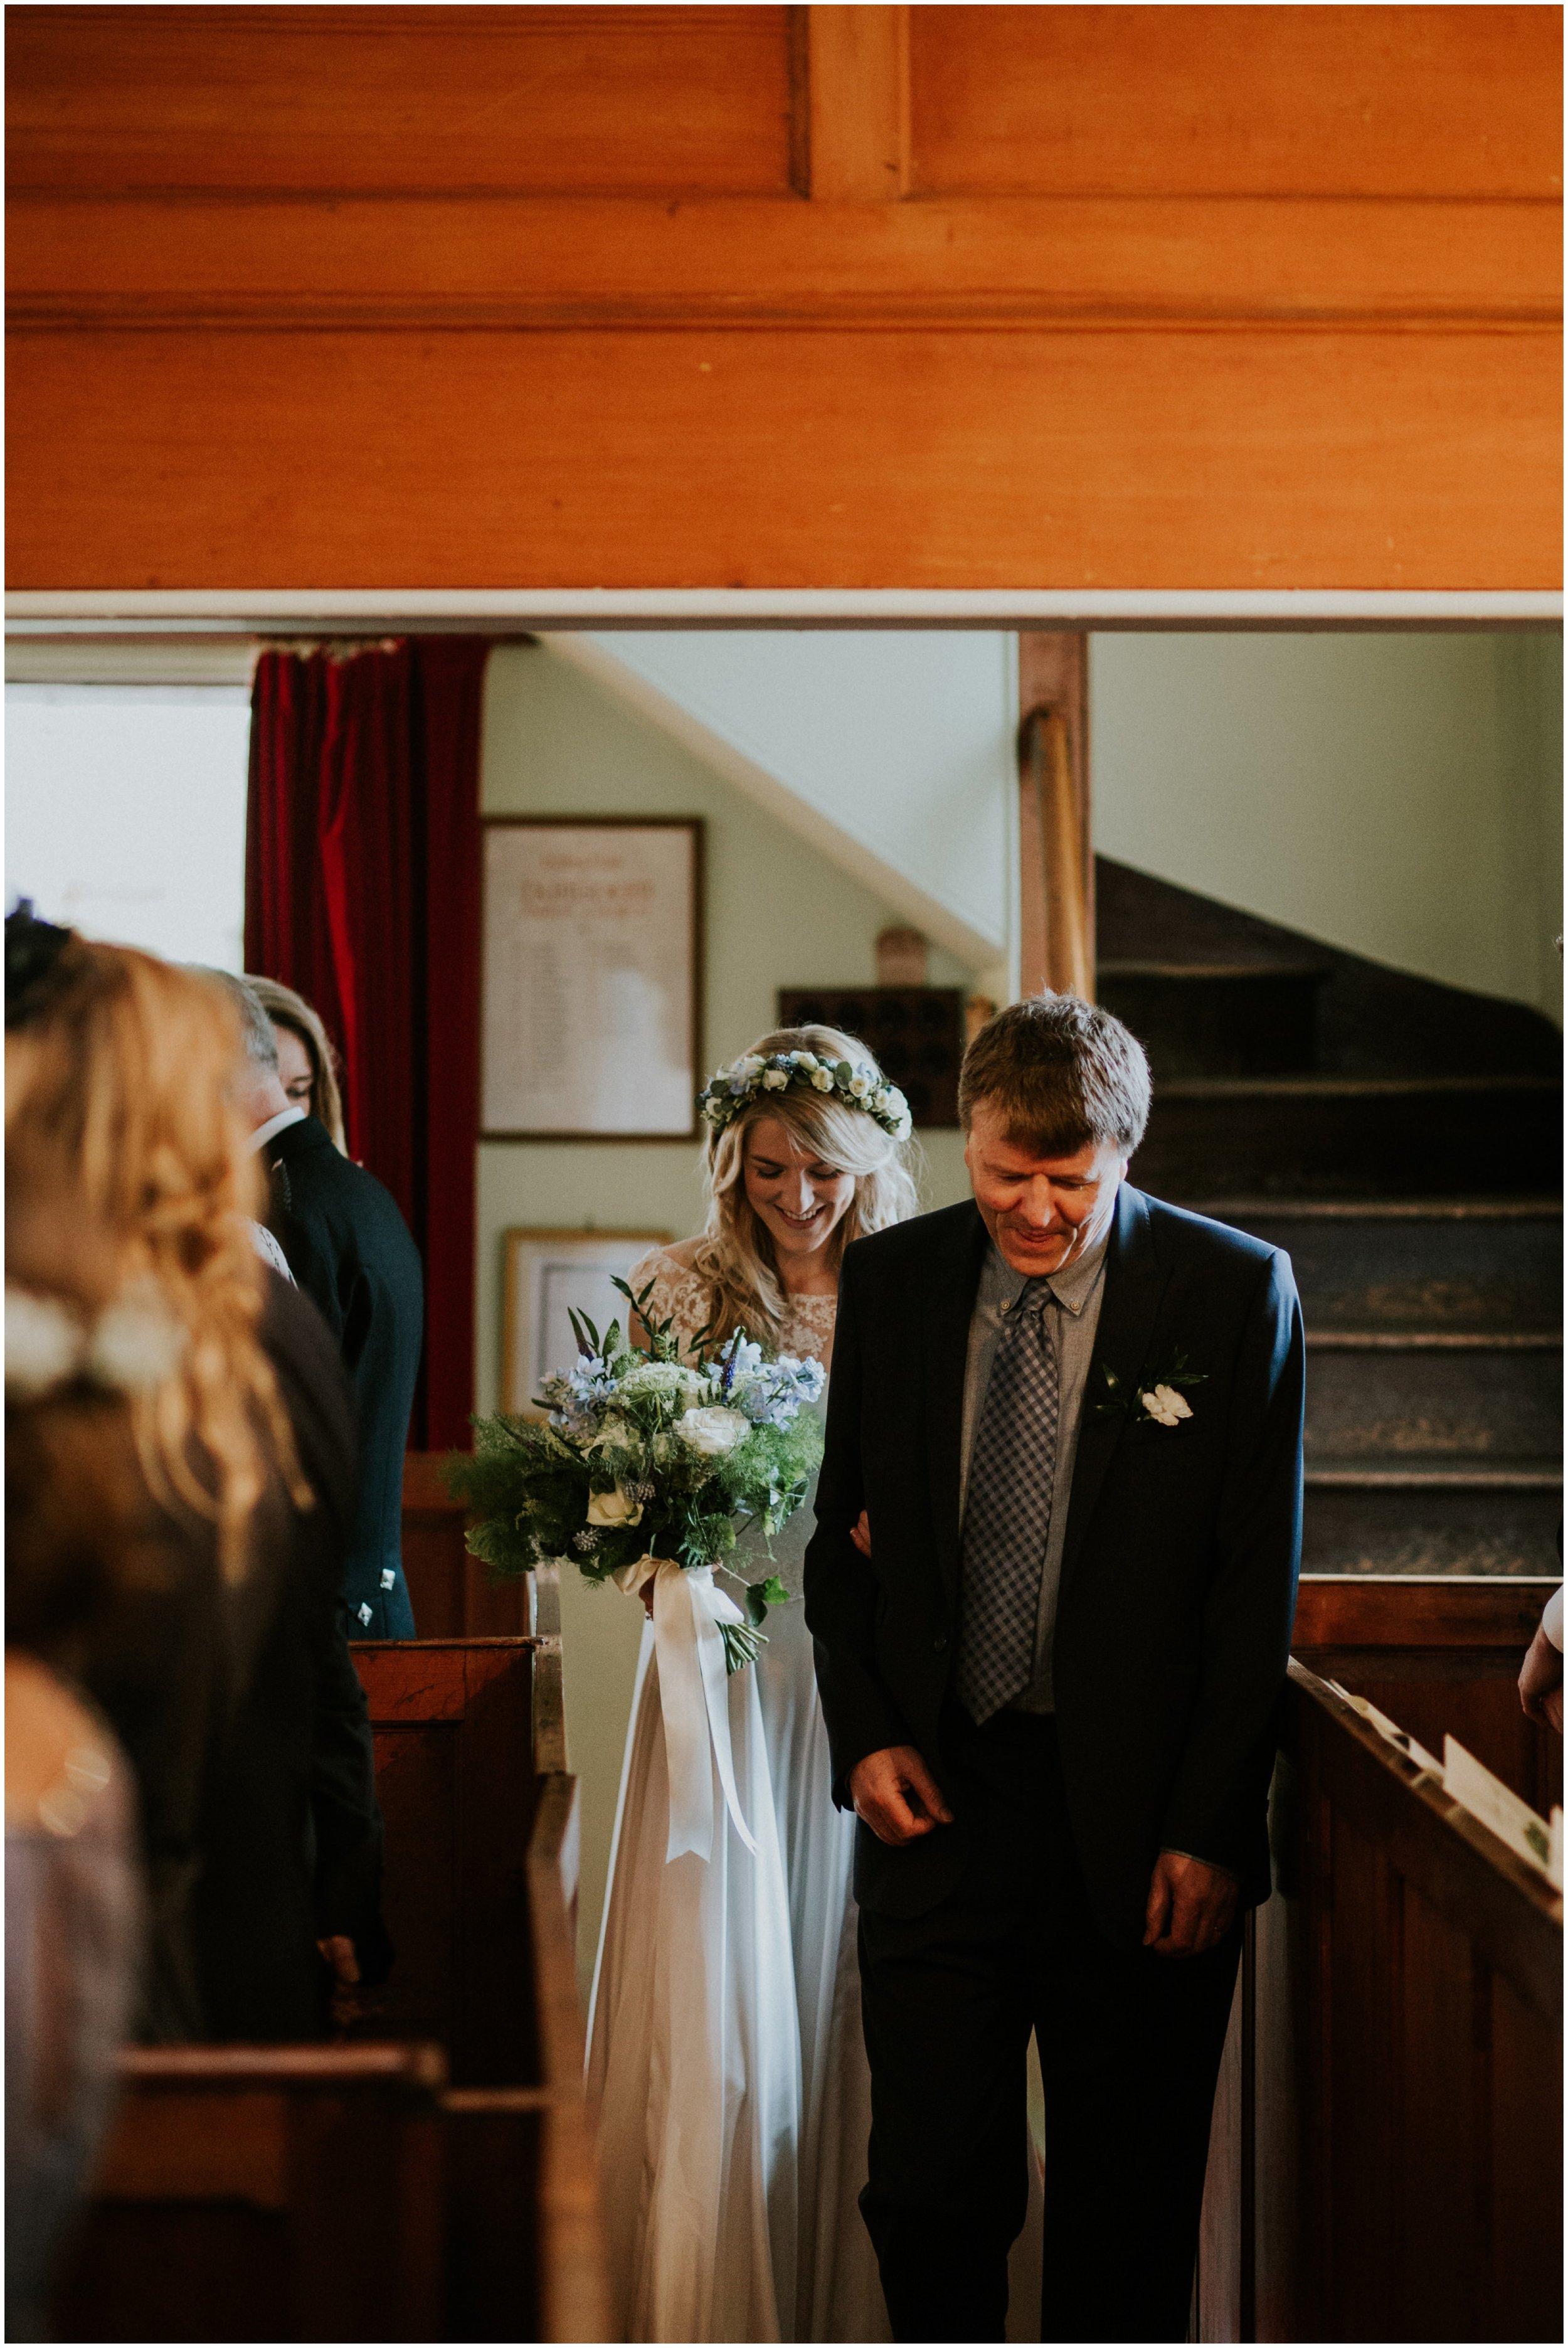 Photography 78 - Glasgow Wedding Photographer - Dave & Alana_0031.jpg